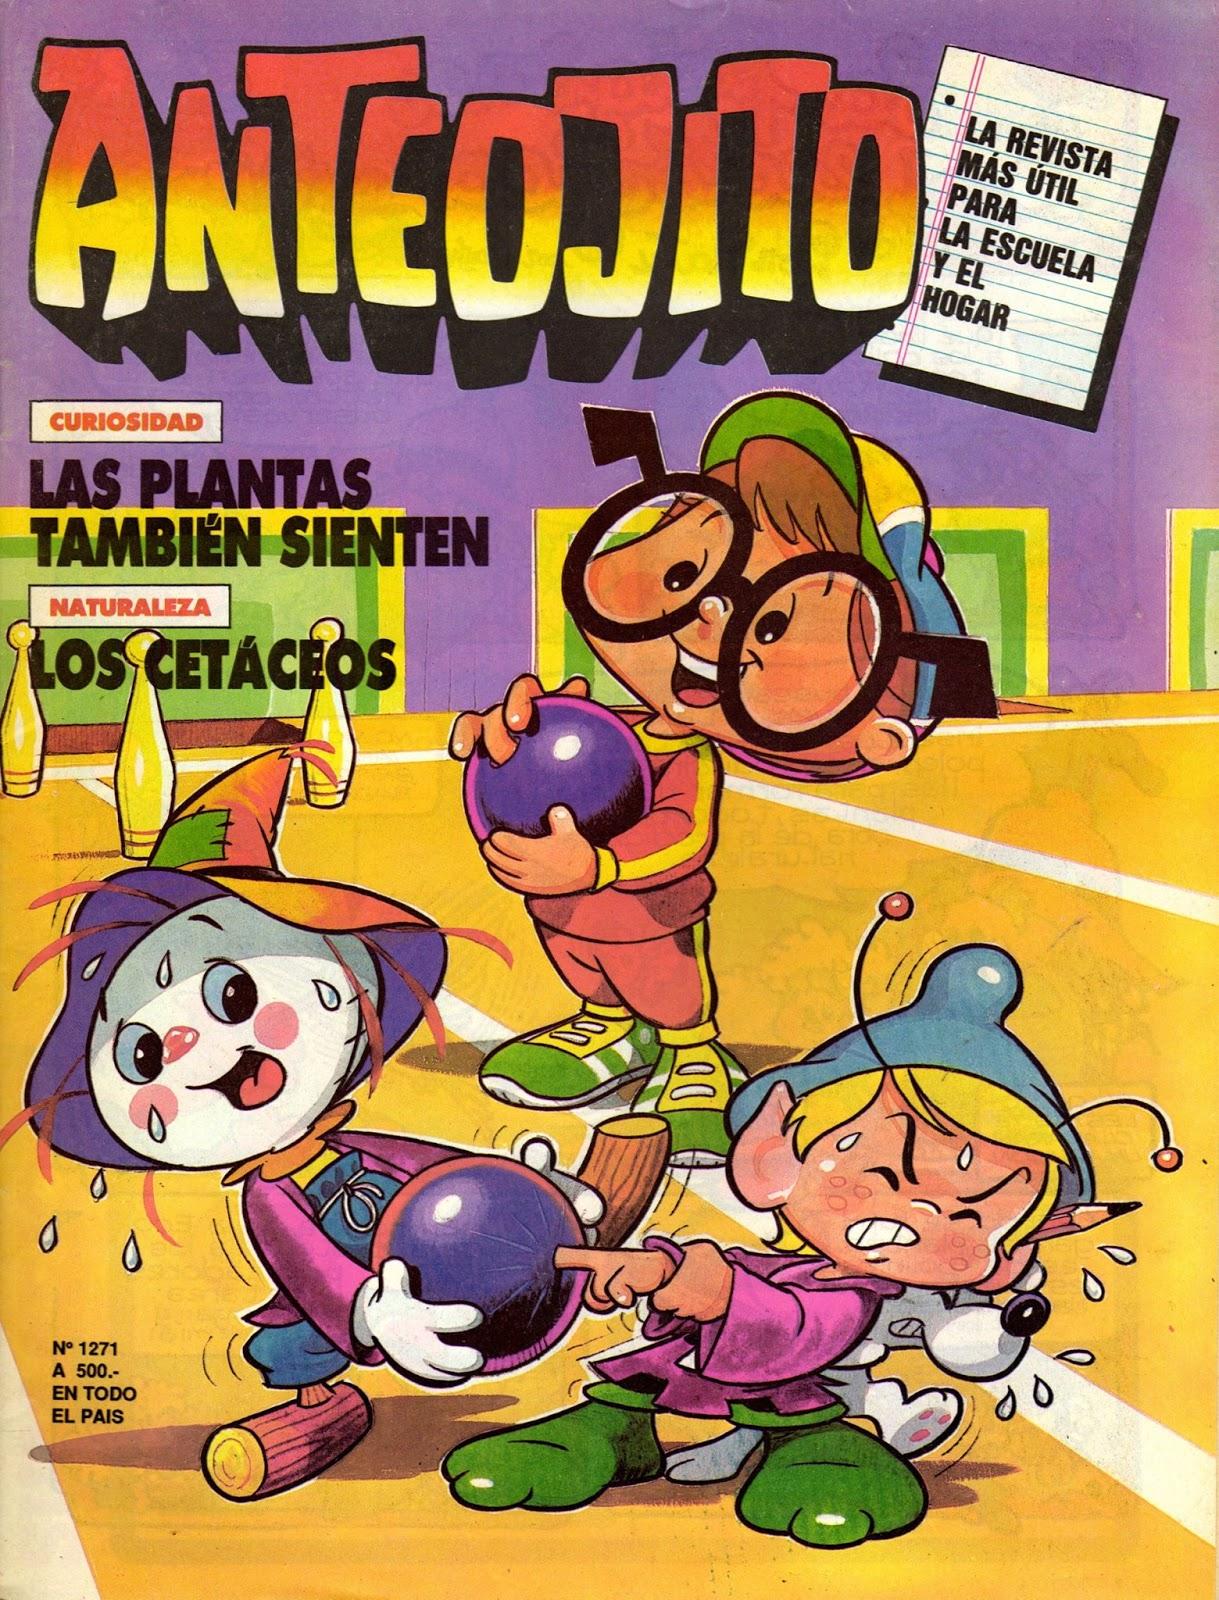 Revista Anteojito (1989)